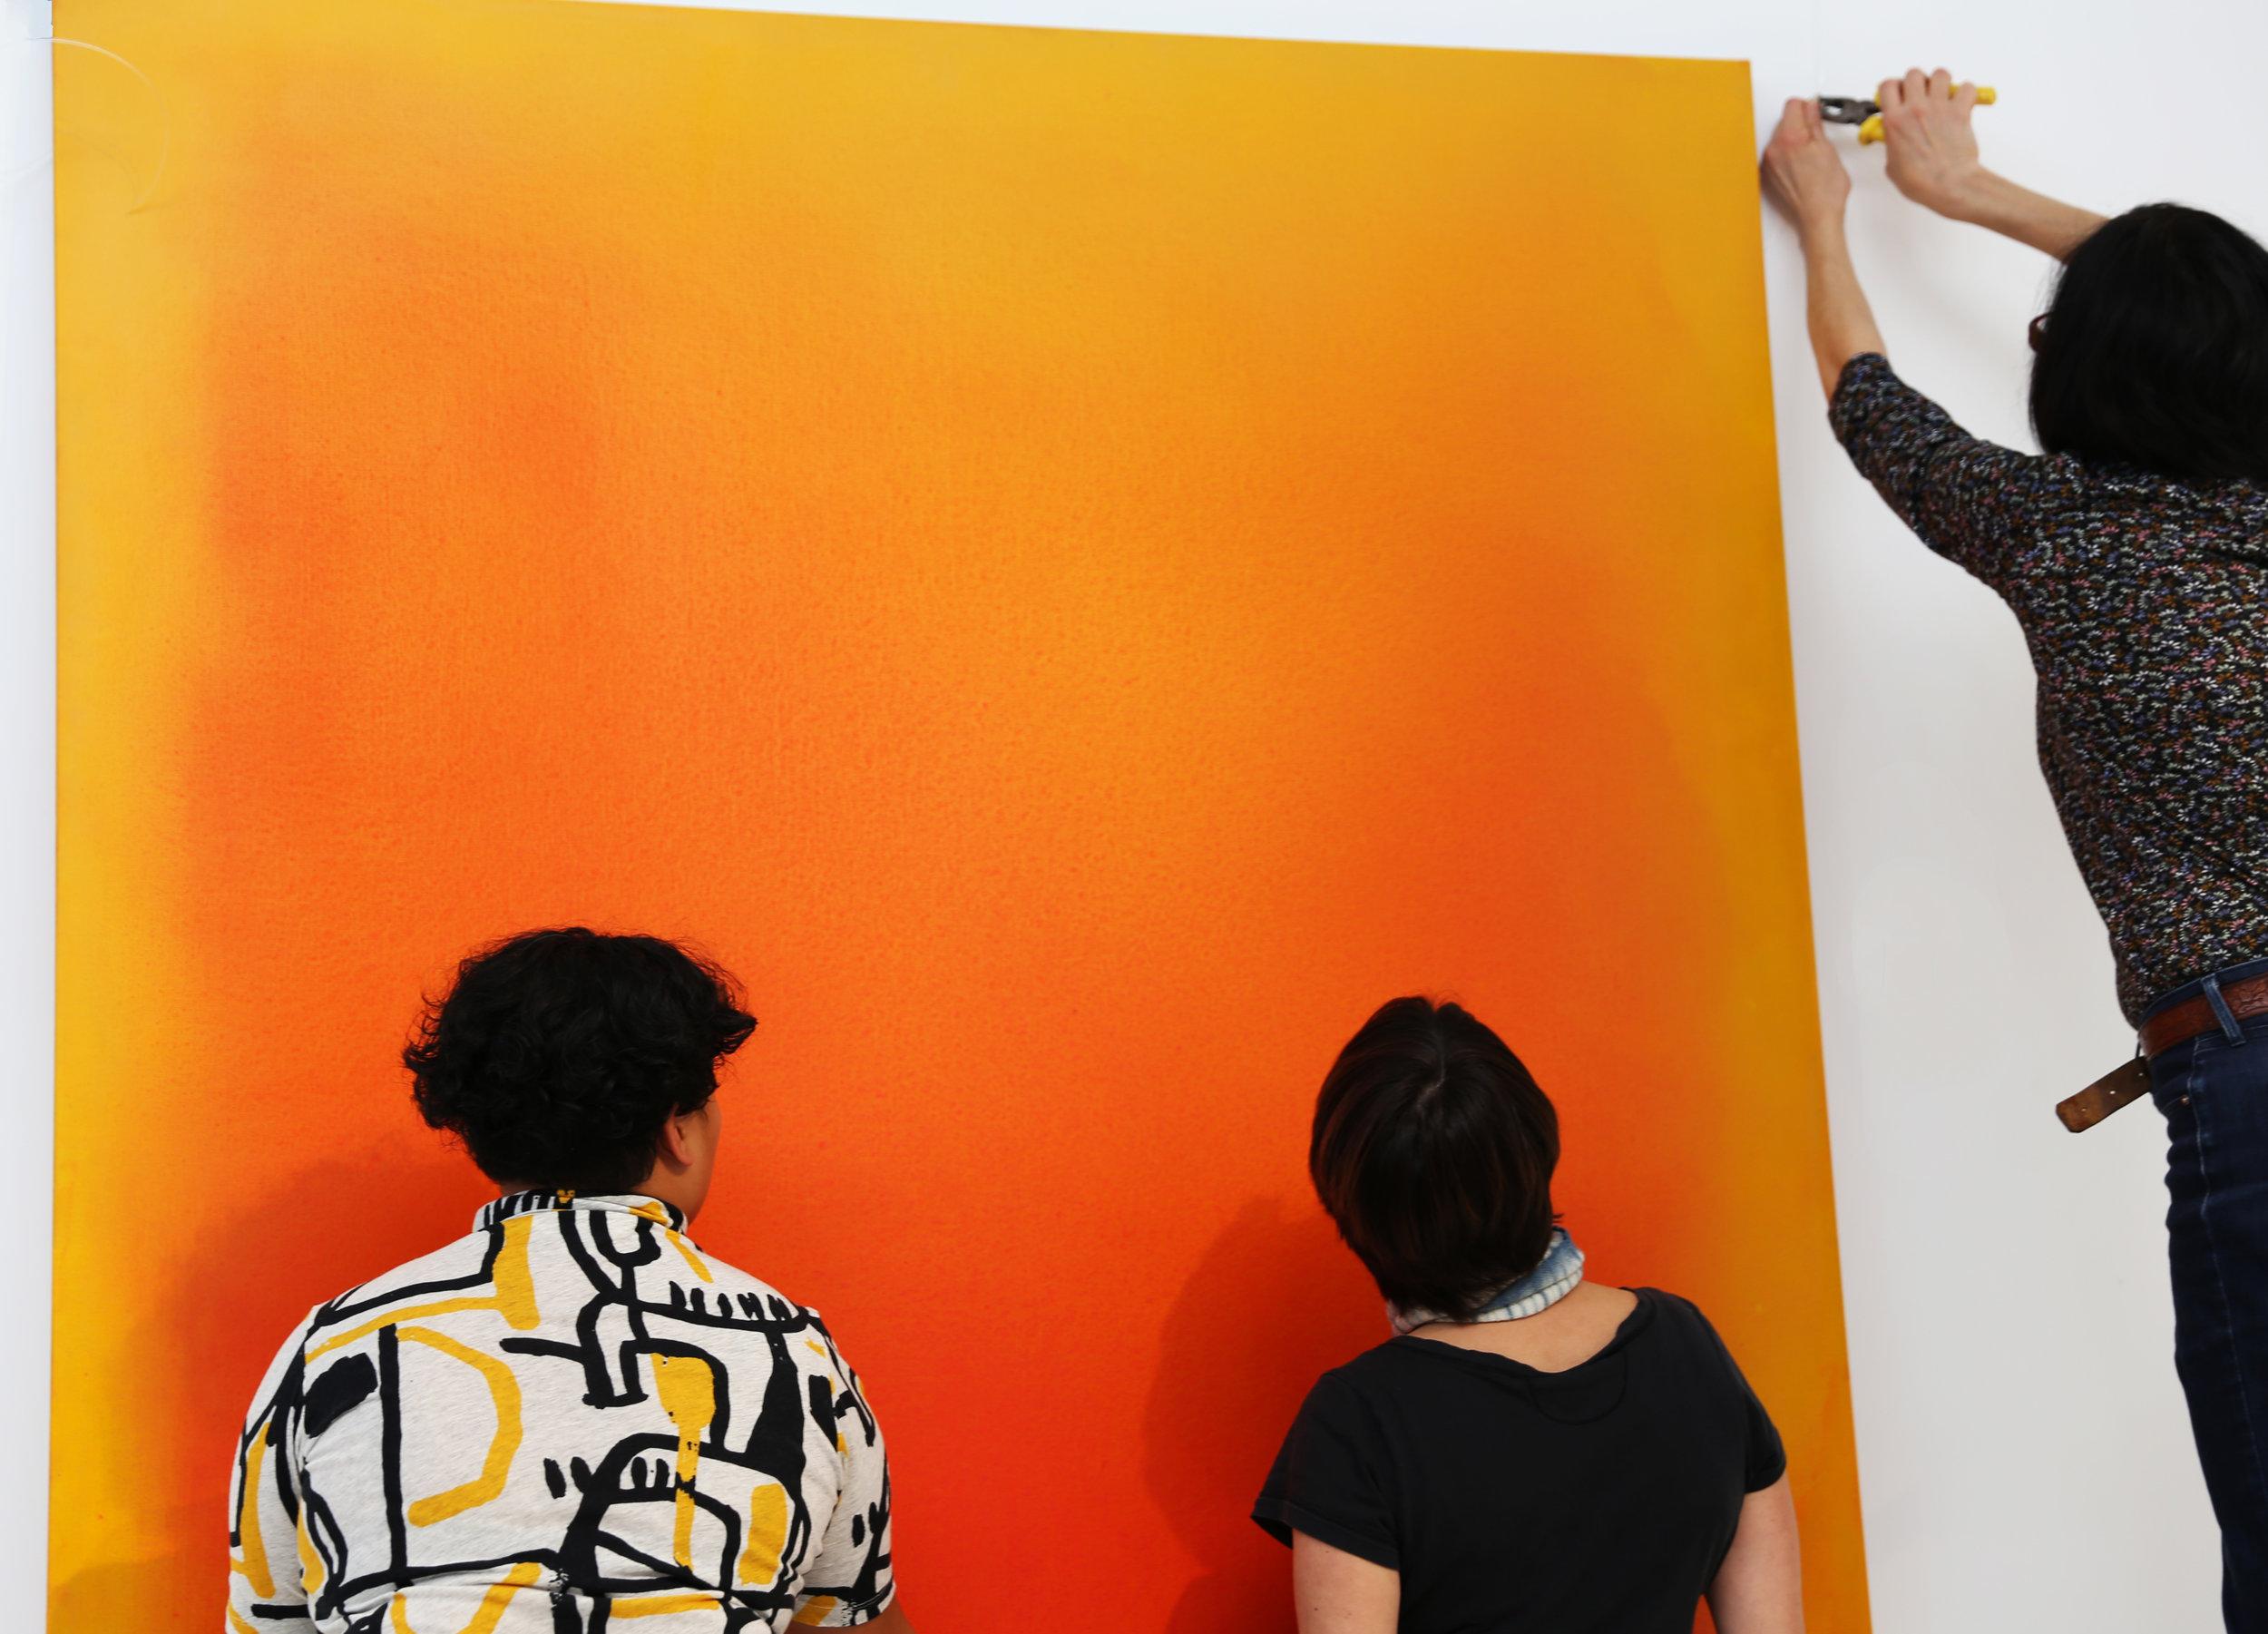 Breathing Colours_Installation_L-R_Rosell Flatley_Elefteria Vlavianos_Nuha Saad_Credit_Art Pharmacy_Vandal __3495.jpg